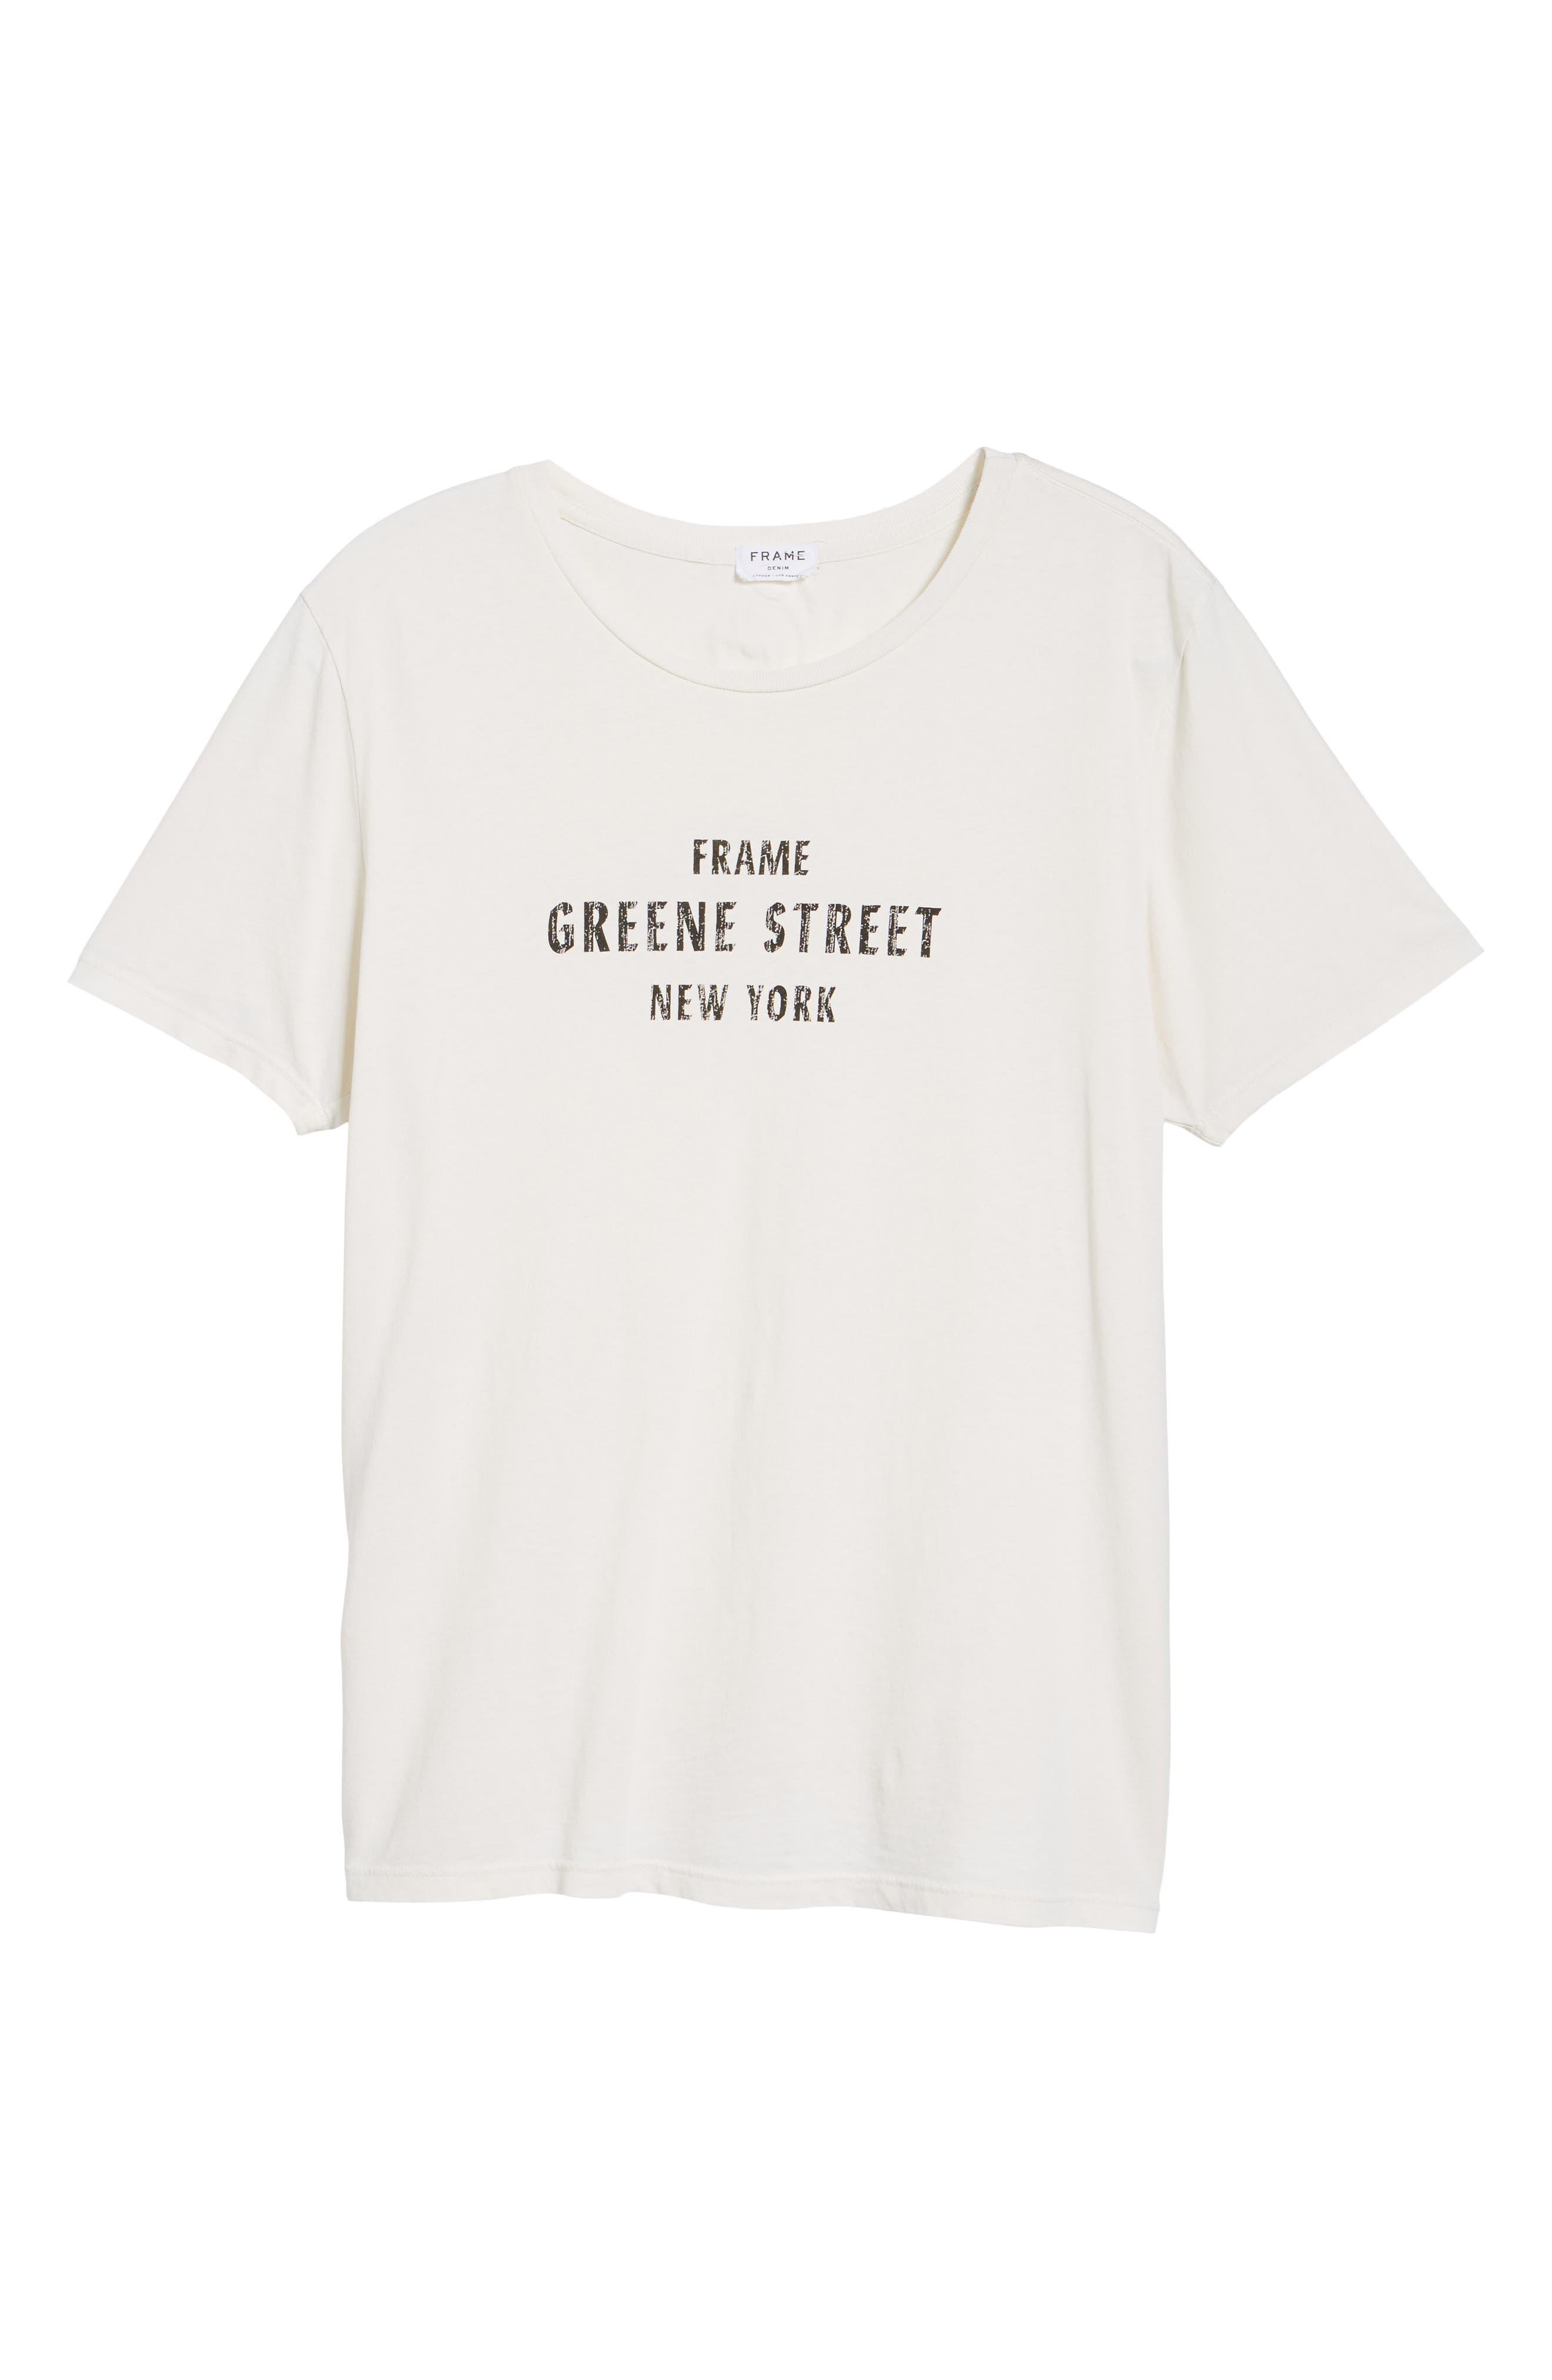 Greene Street Vintage Graphic T-Shirt,                             Alternate thumbnail 6, color,                             Off White